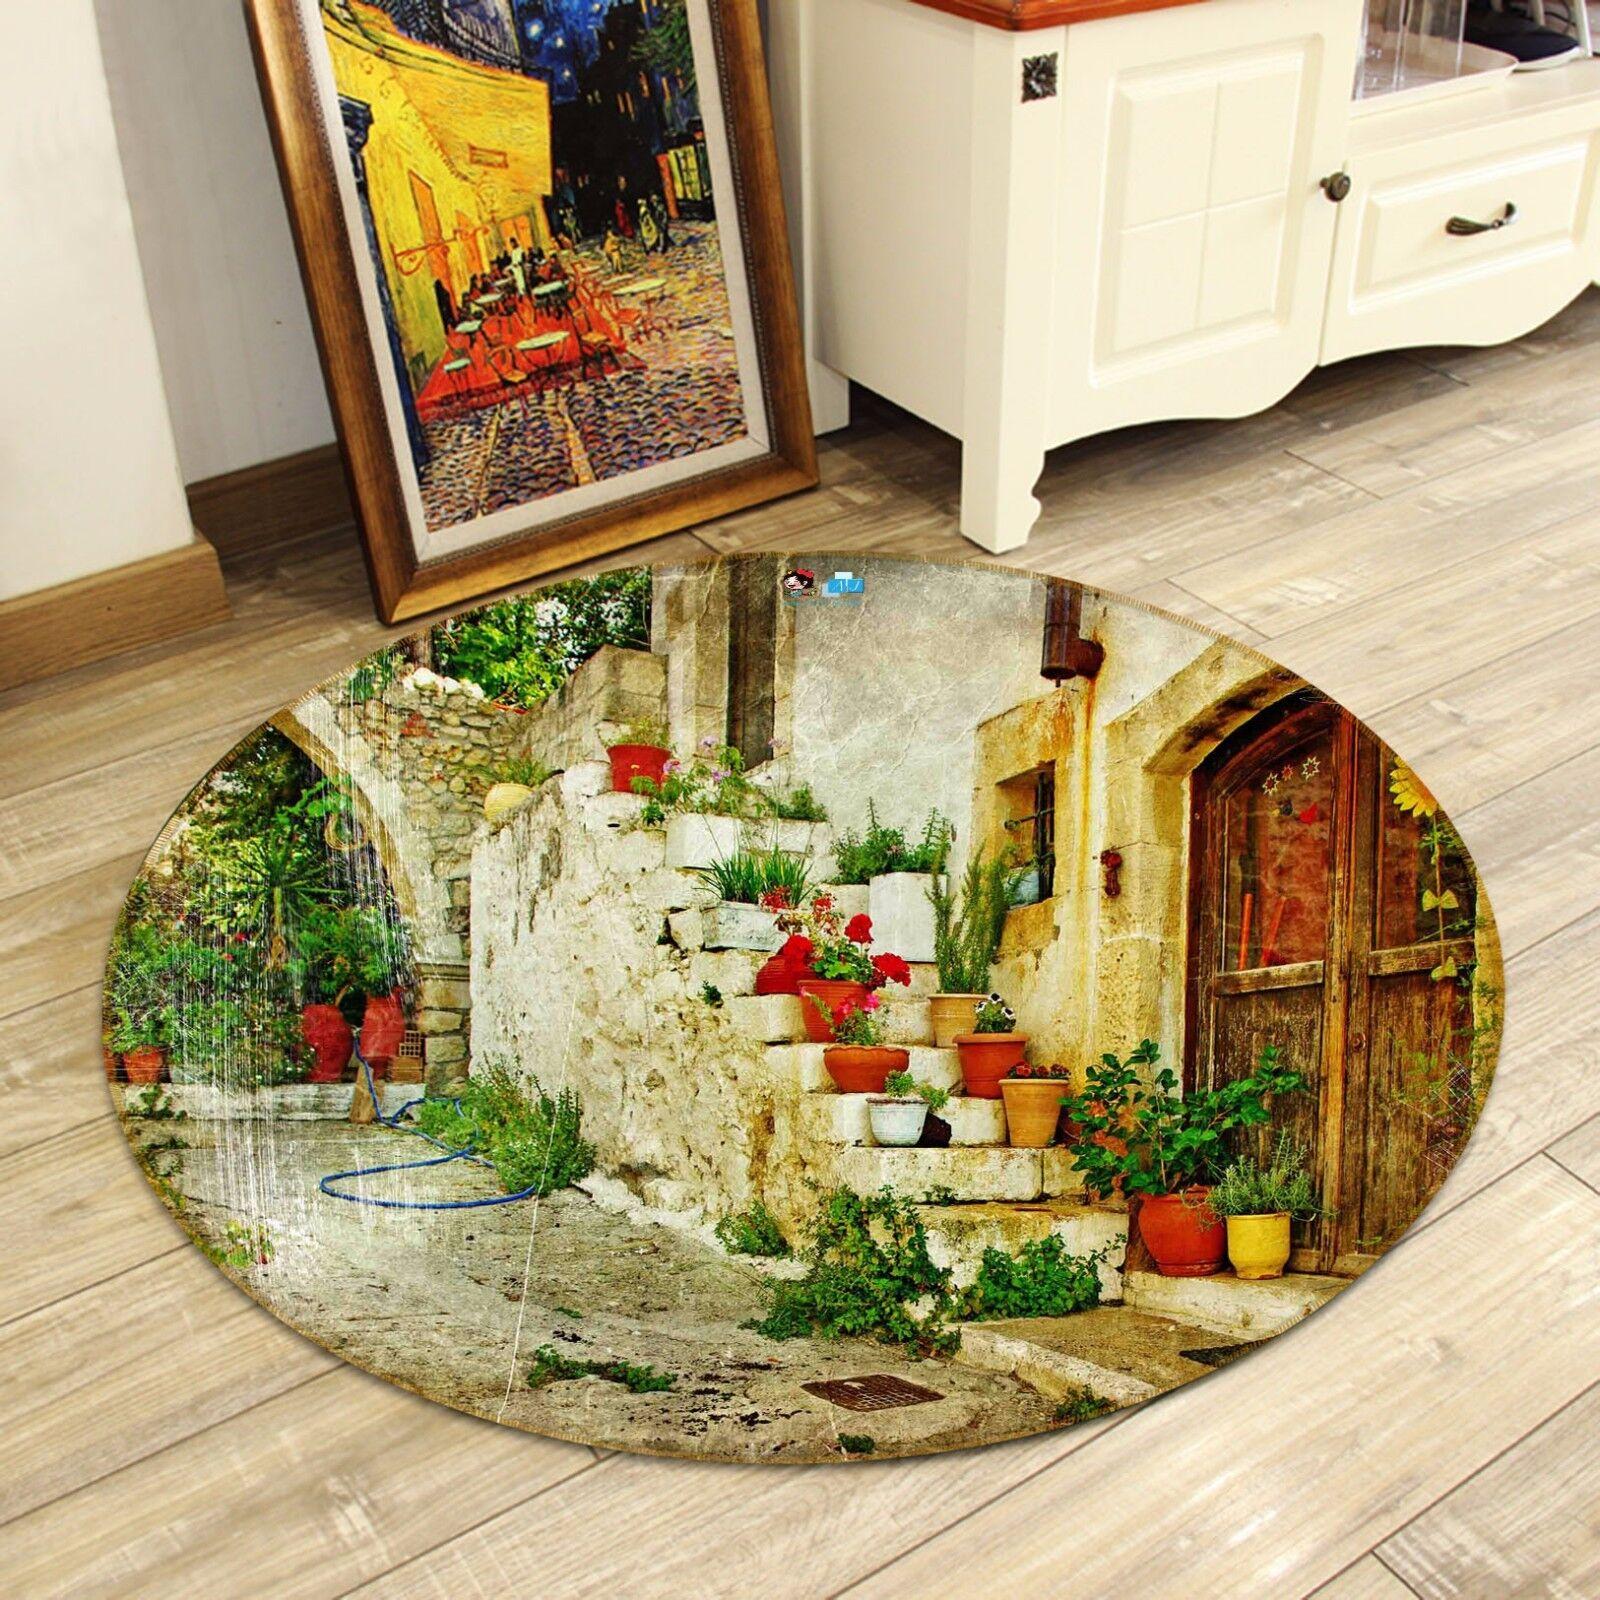 3D Nostalgic Courtyard 7 Non Non Non Slip Rug Mat Room Mat Round Elegant Photo Carpet CA 90e4ec